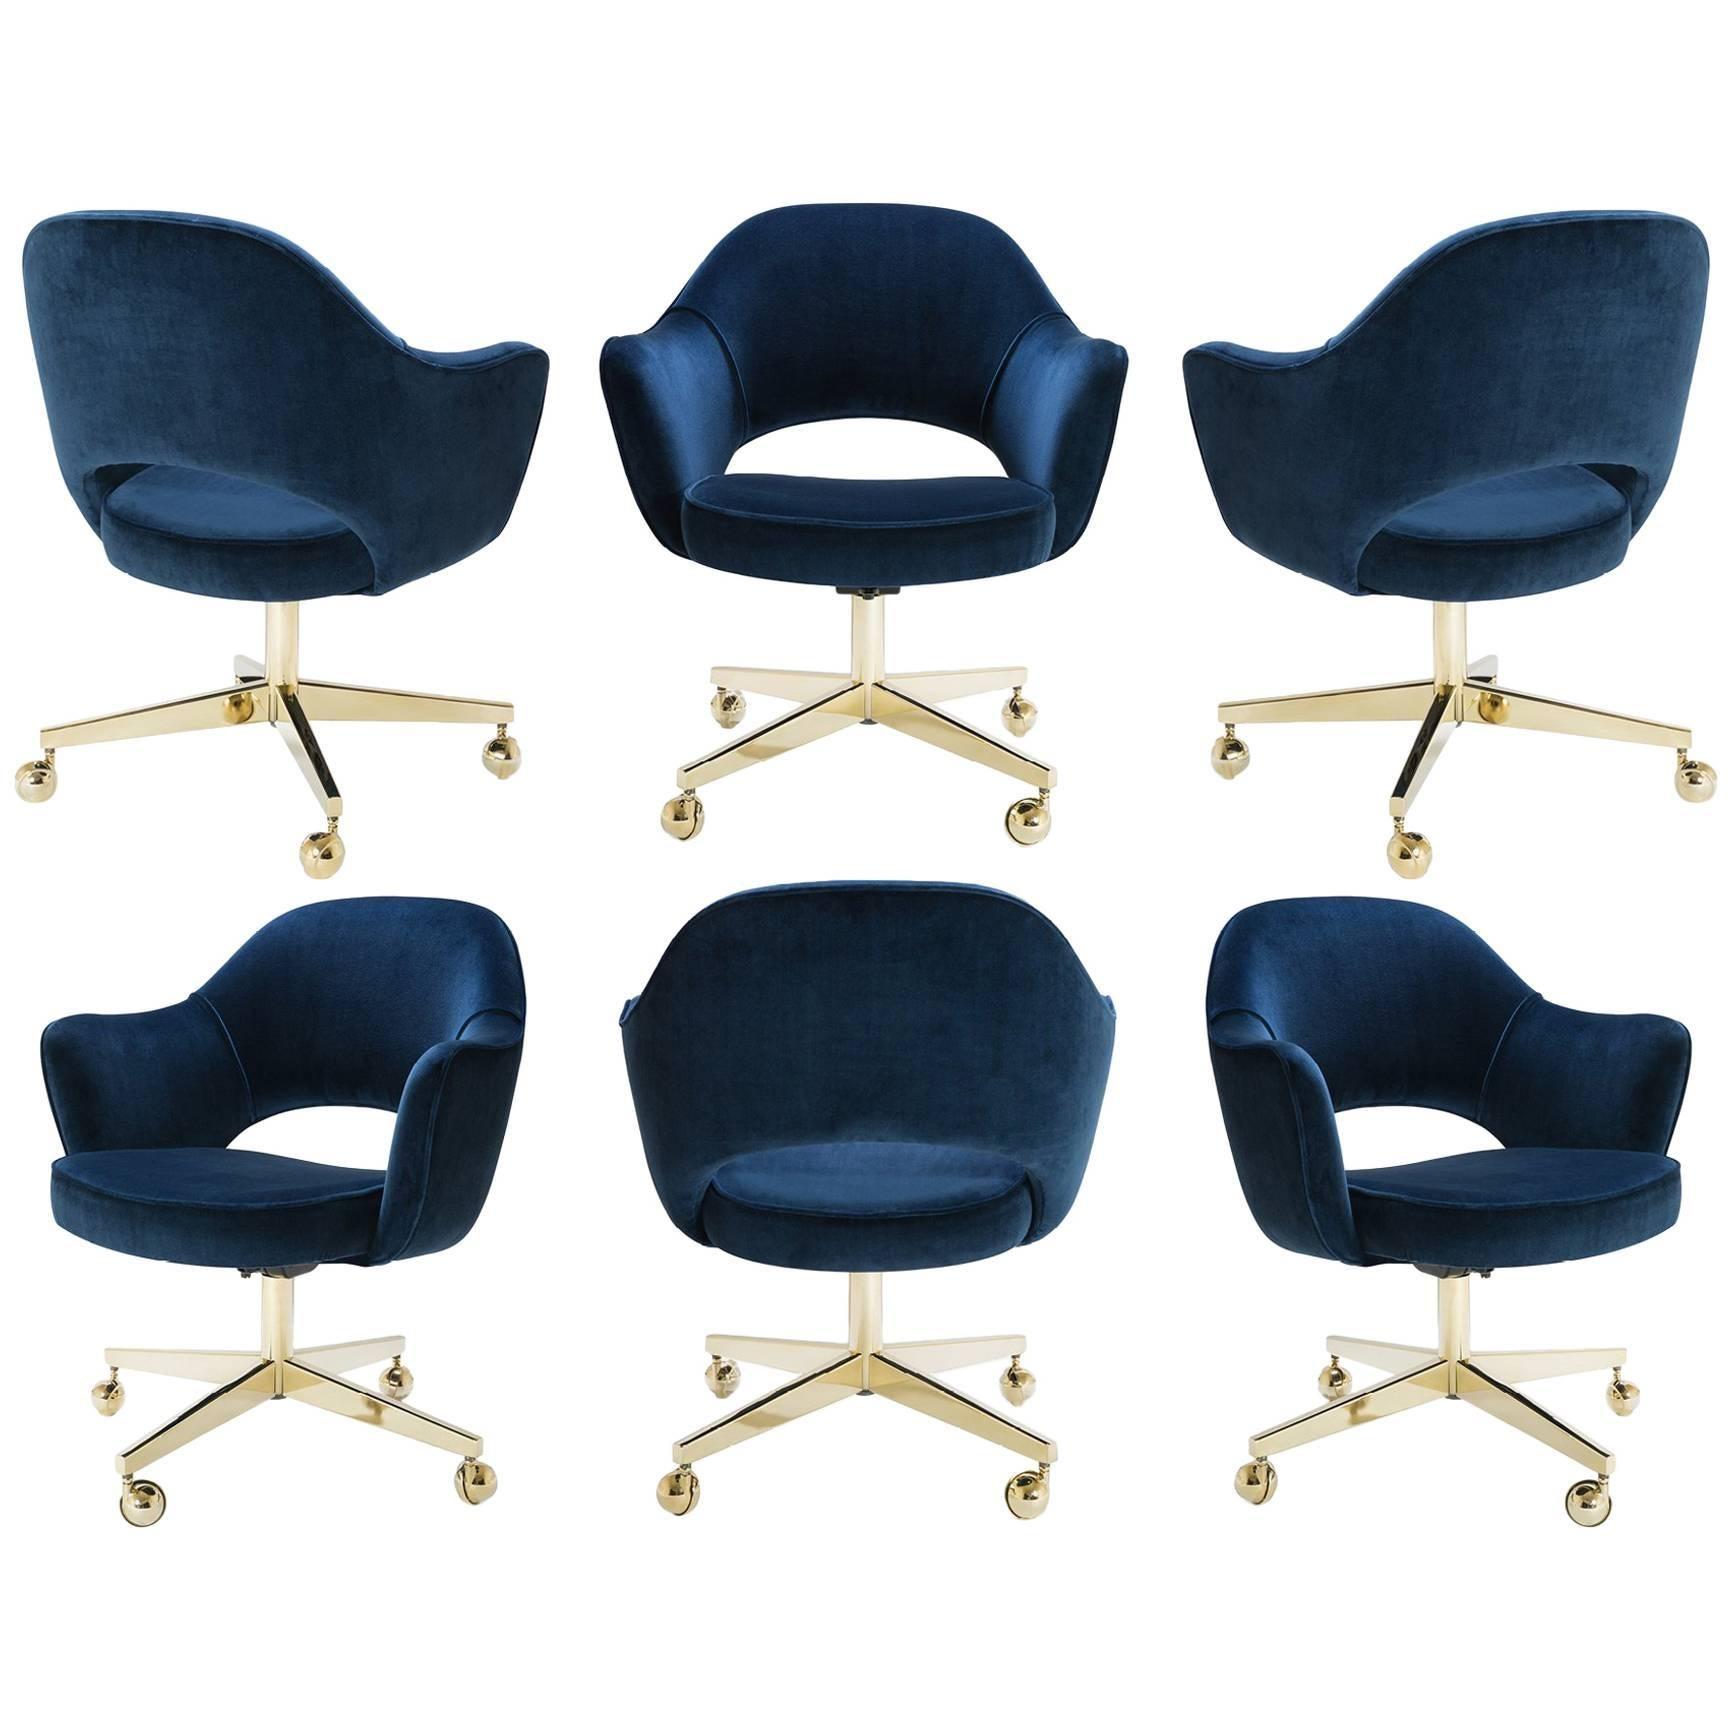 New And Custom Swivel Chairs